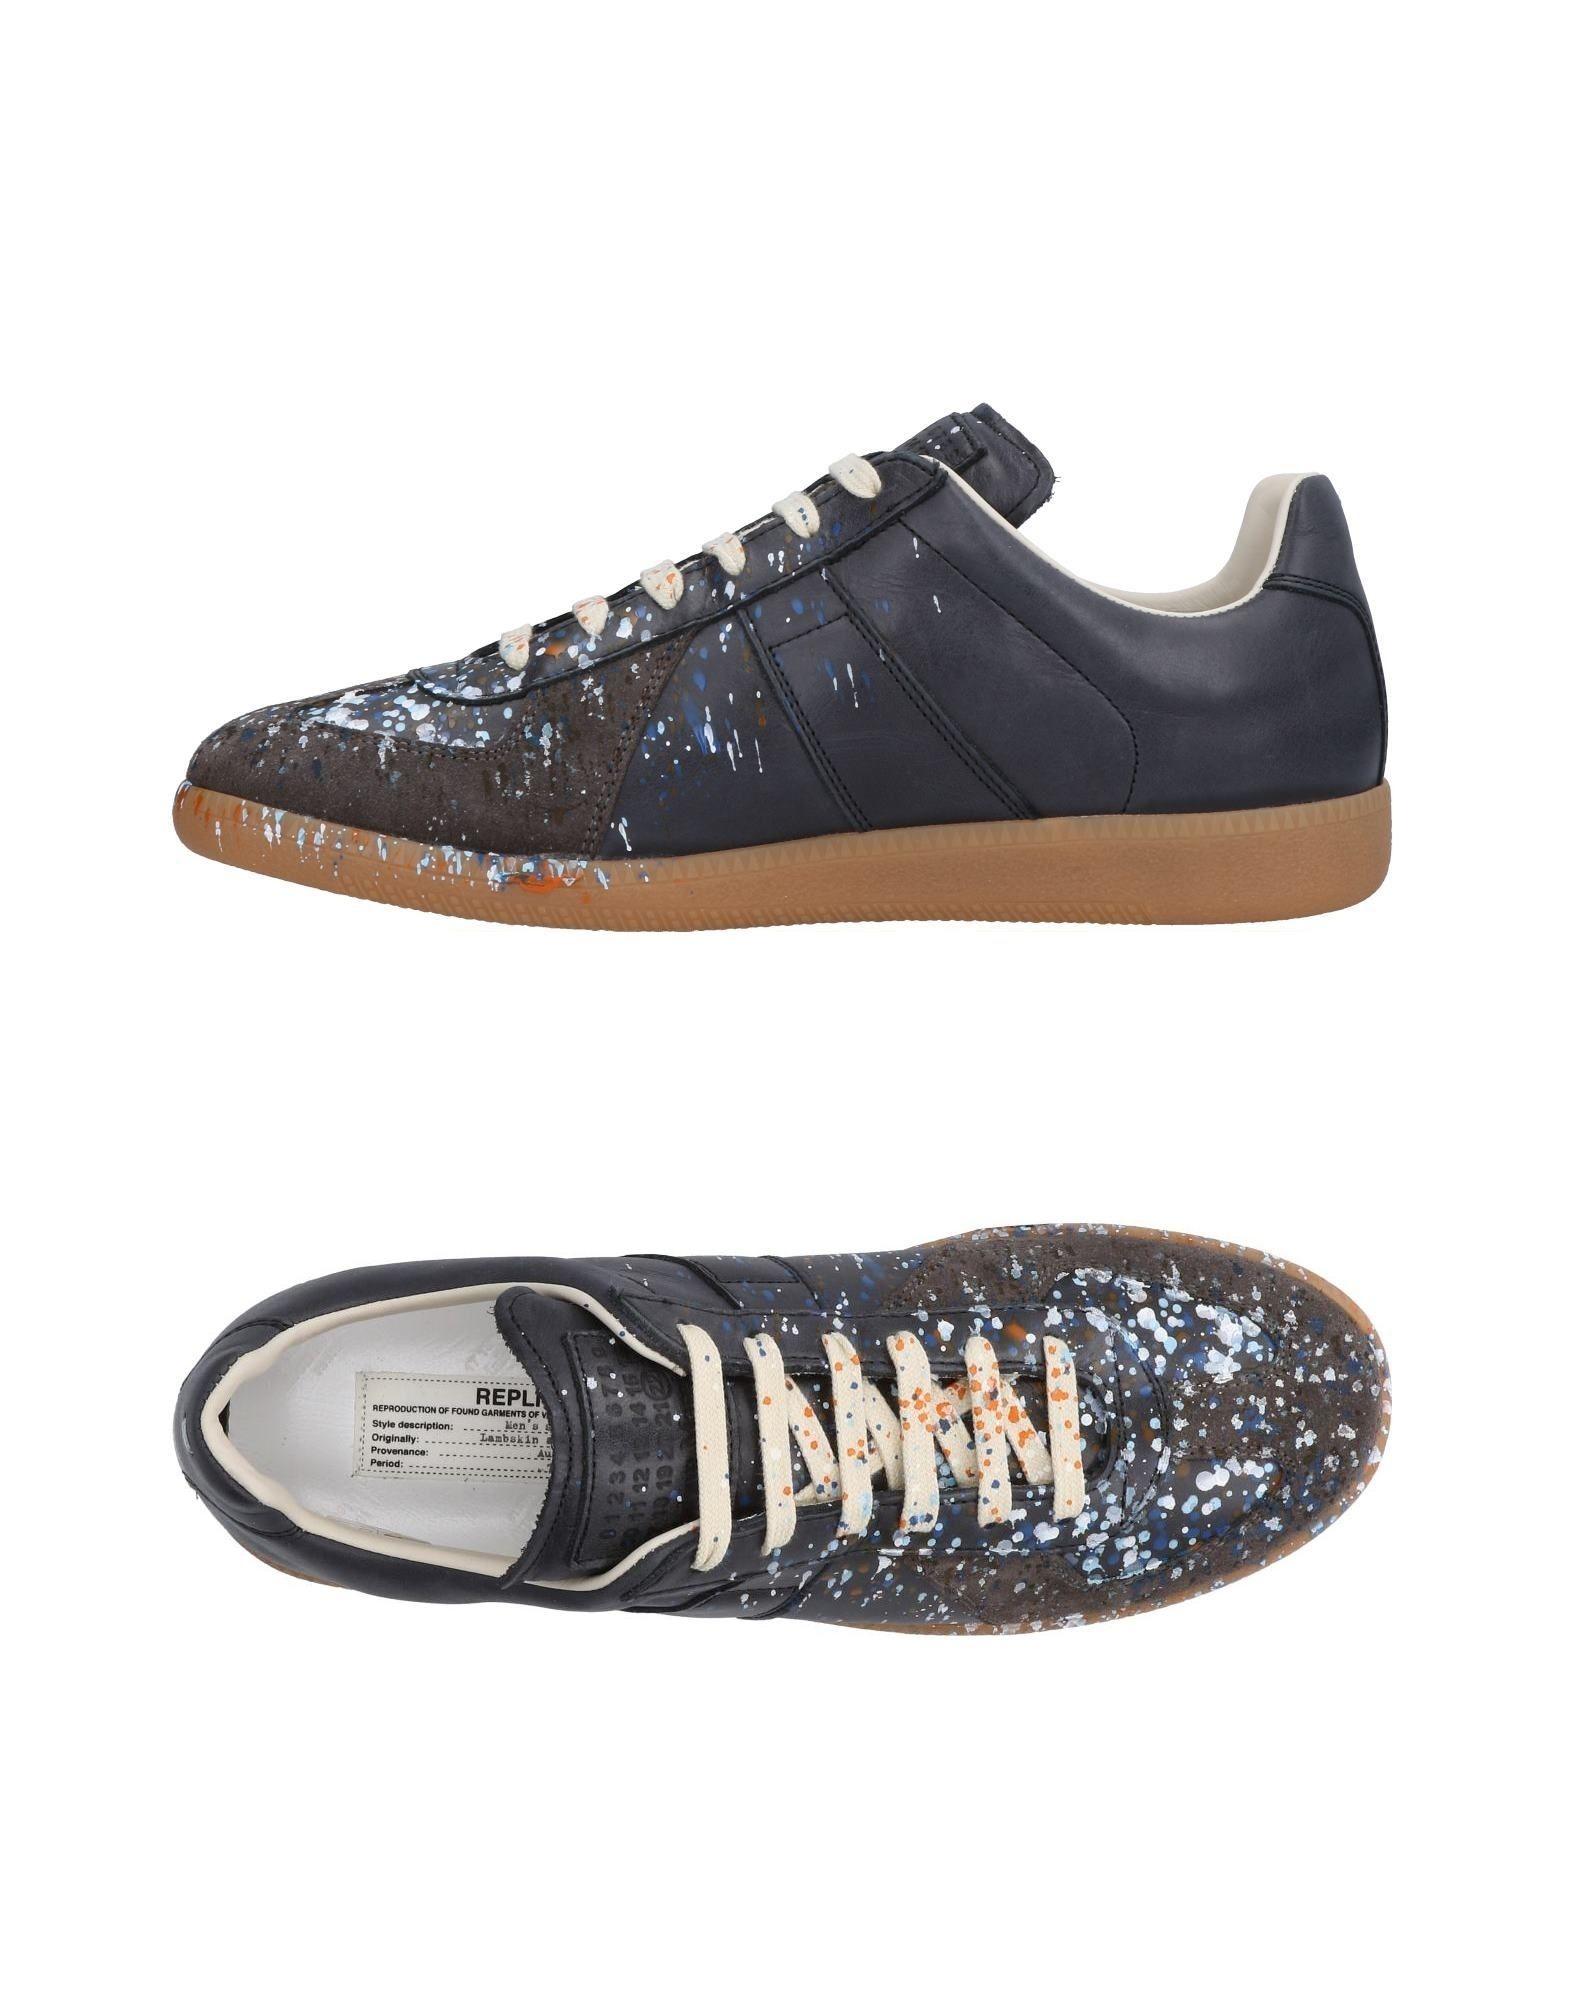 Maison Margiela Sneakers  Herren  Sneakers 11463795WK e5be92